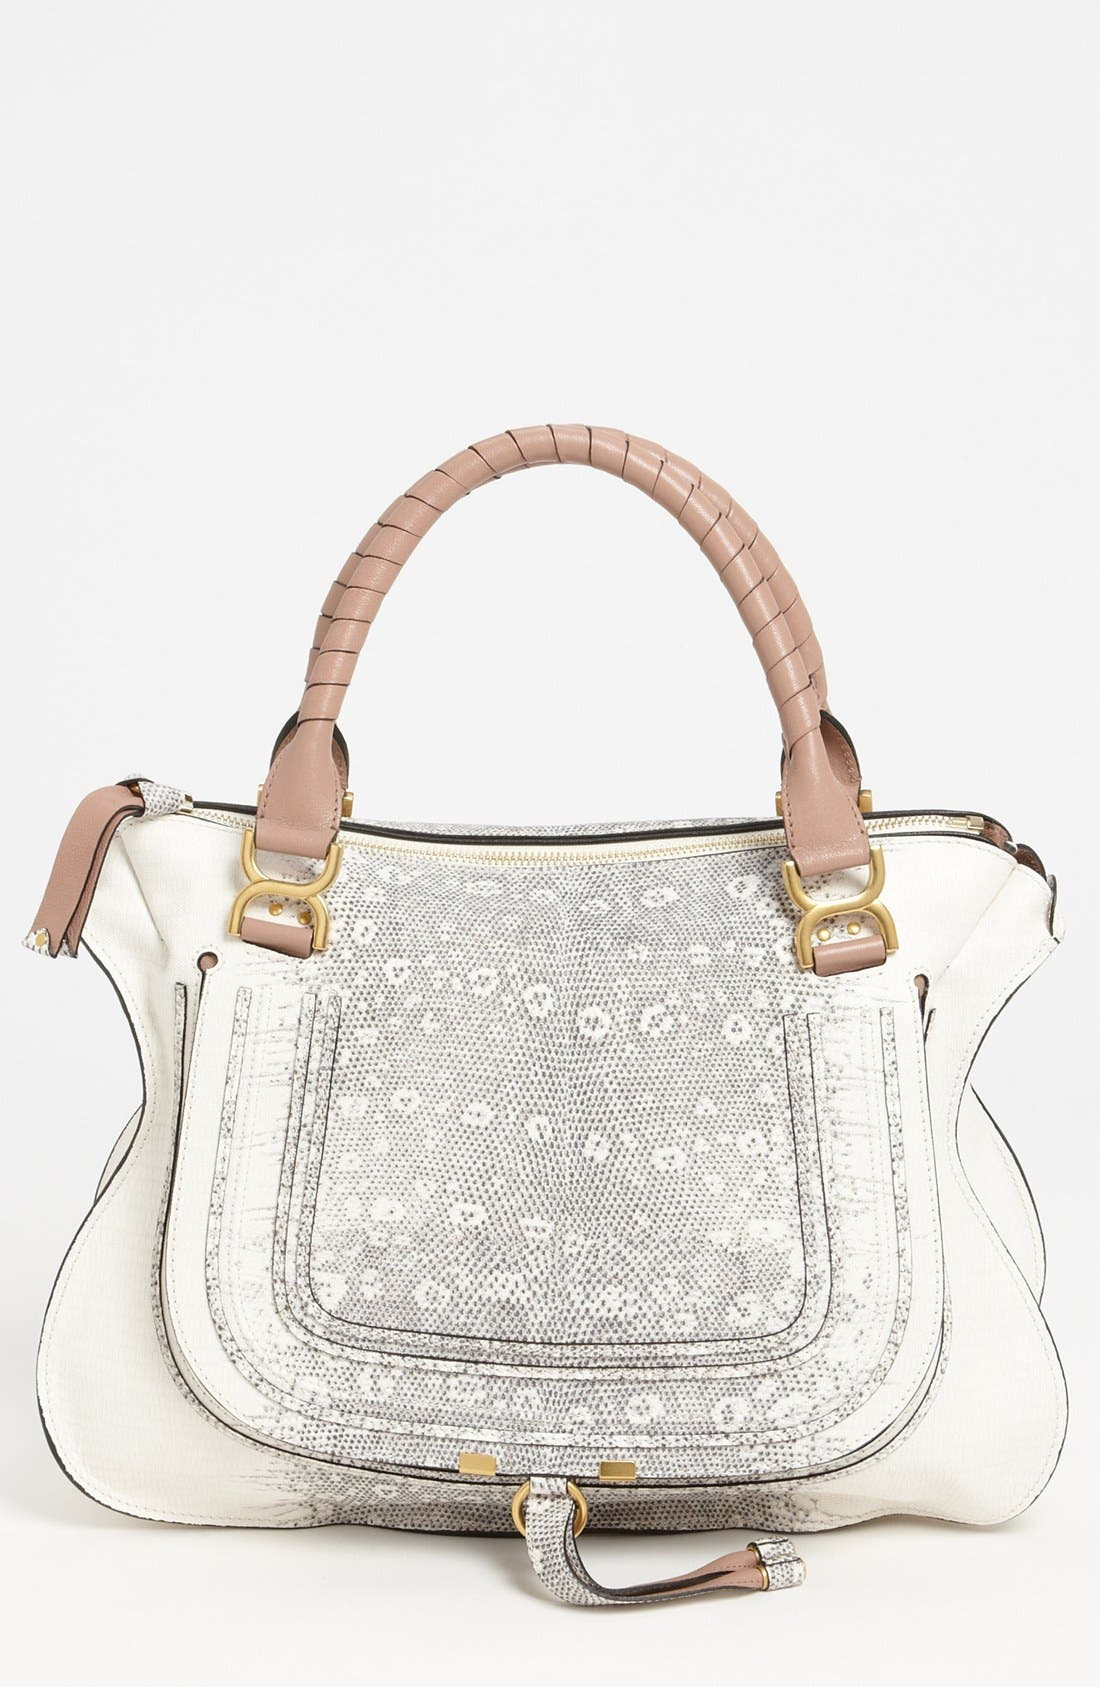 Main Image - Chloé 'Marcie - Large' Lizard Print Leather Shoulder Bag